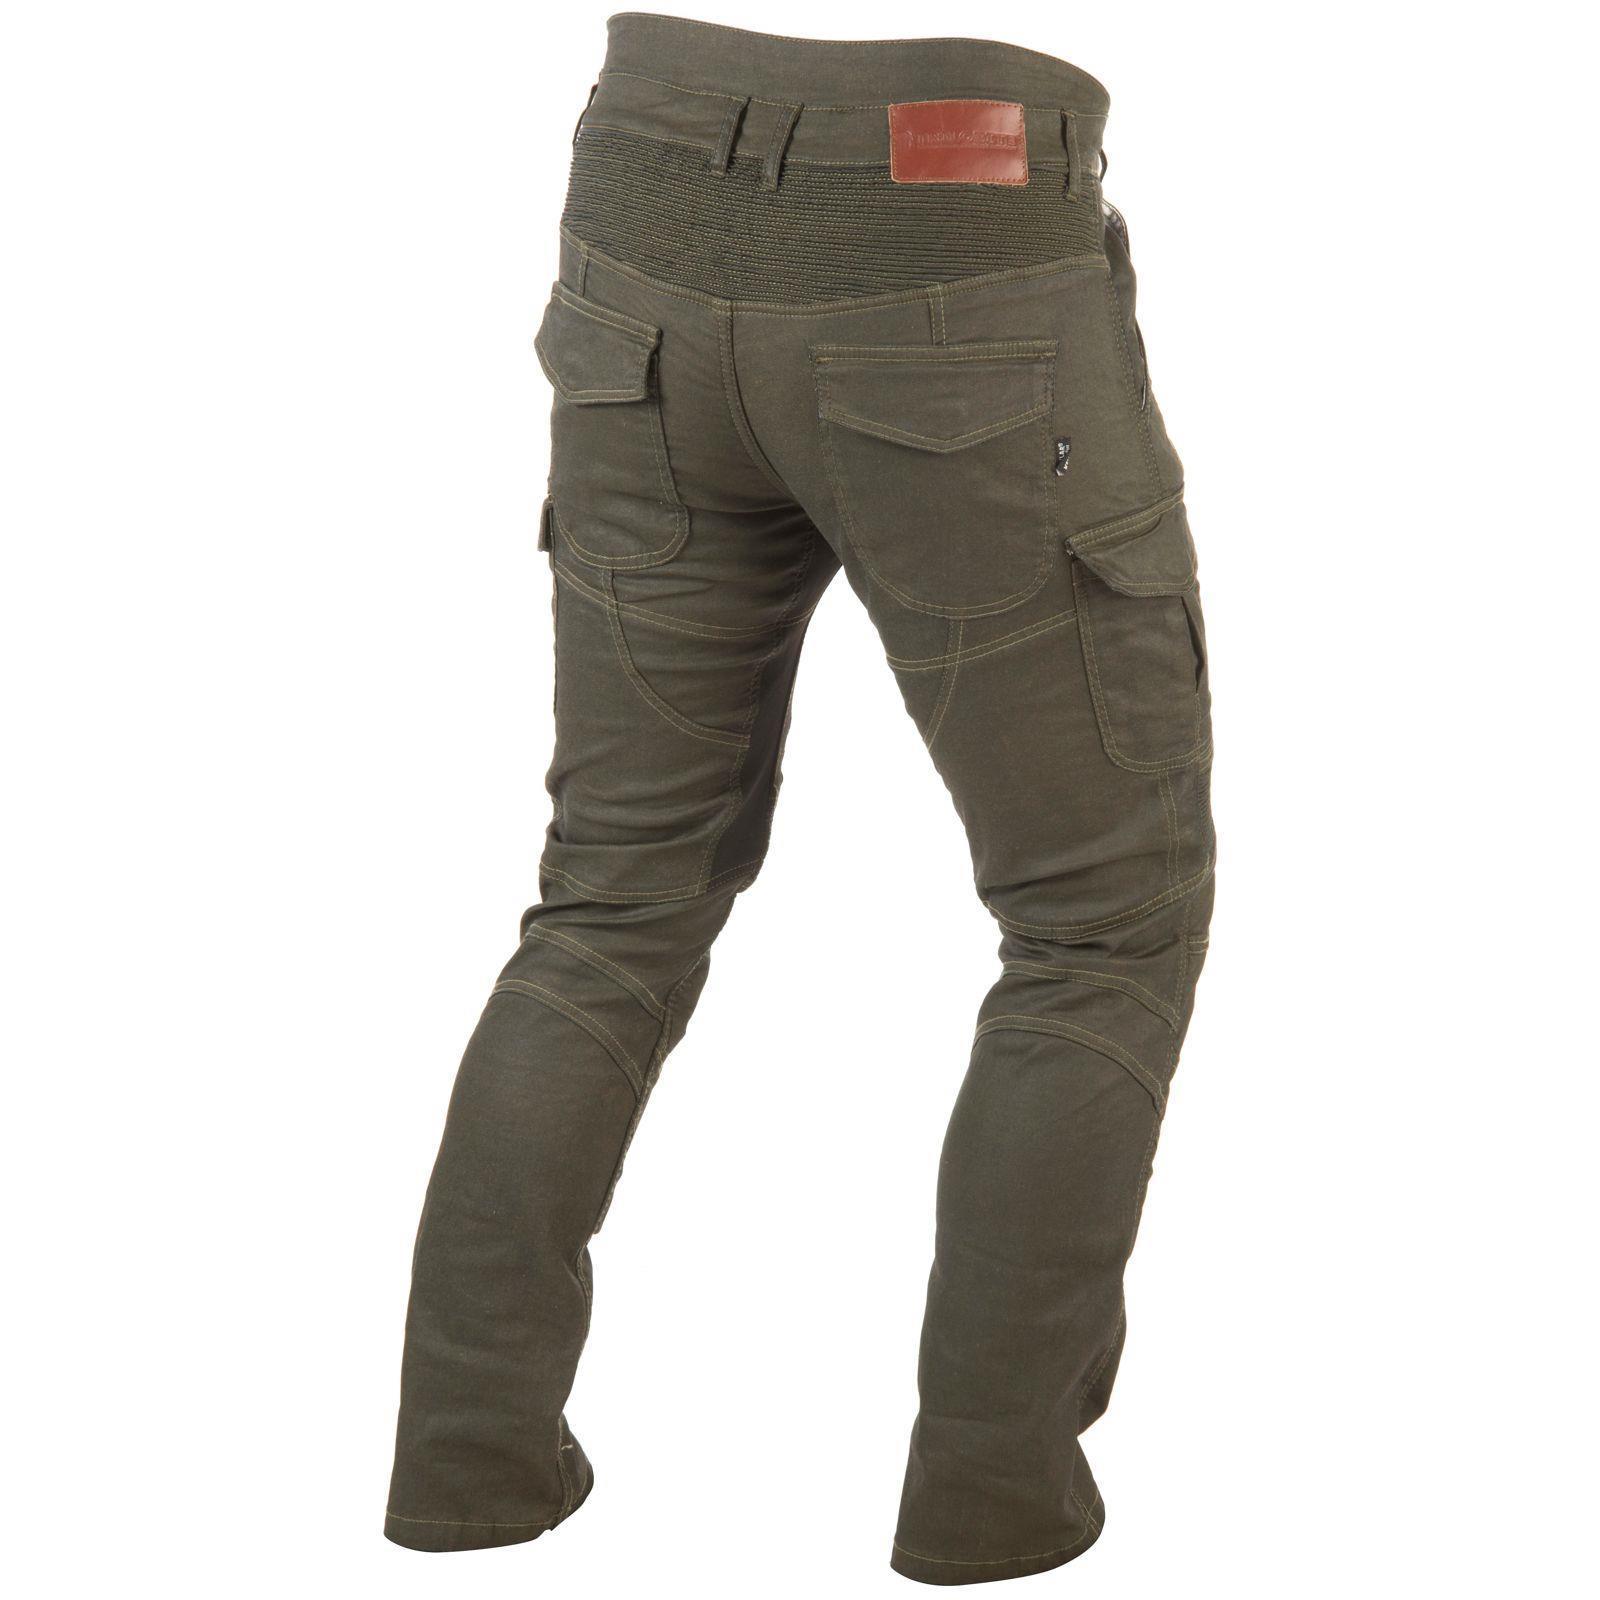 Trilobite-Pantaloni-Moto-Jeans-Abbigliamento-Parado-MICAS-URBAN-DUAL-PANTS-ACID miniatura 38